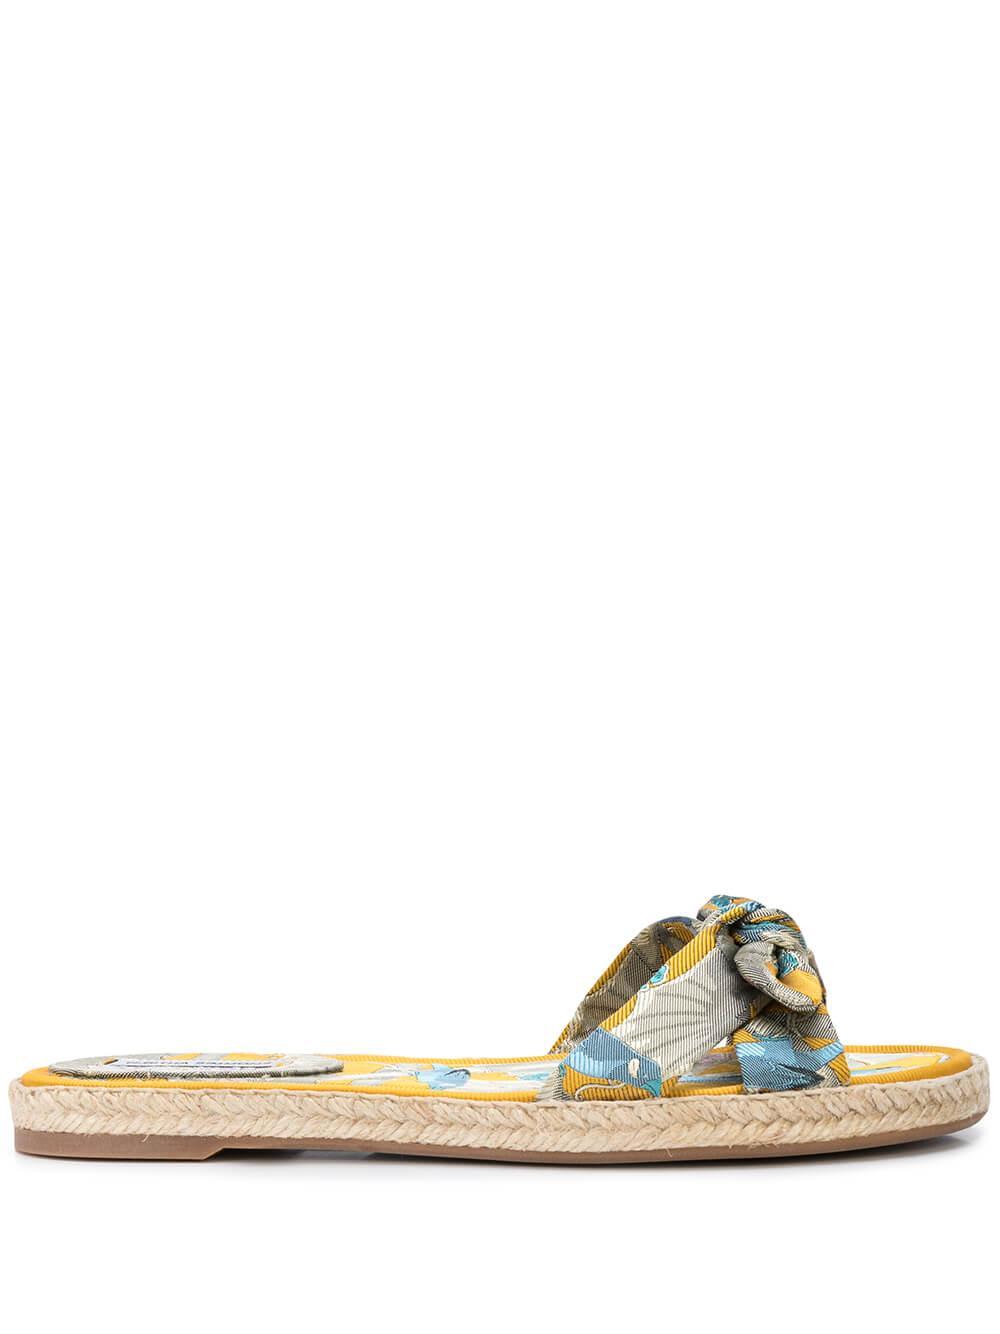 Heli Jacquard Flat Slide Sandal Item # HELI-R20